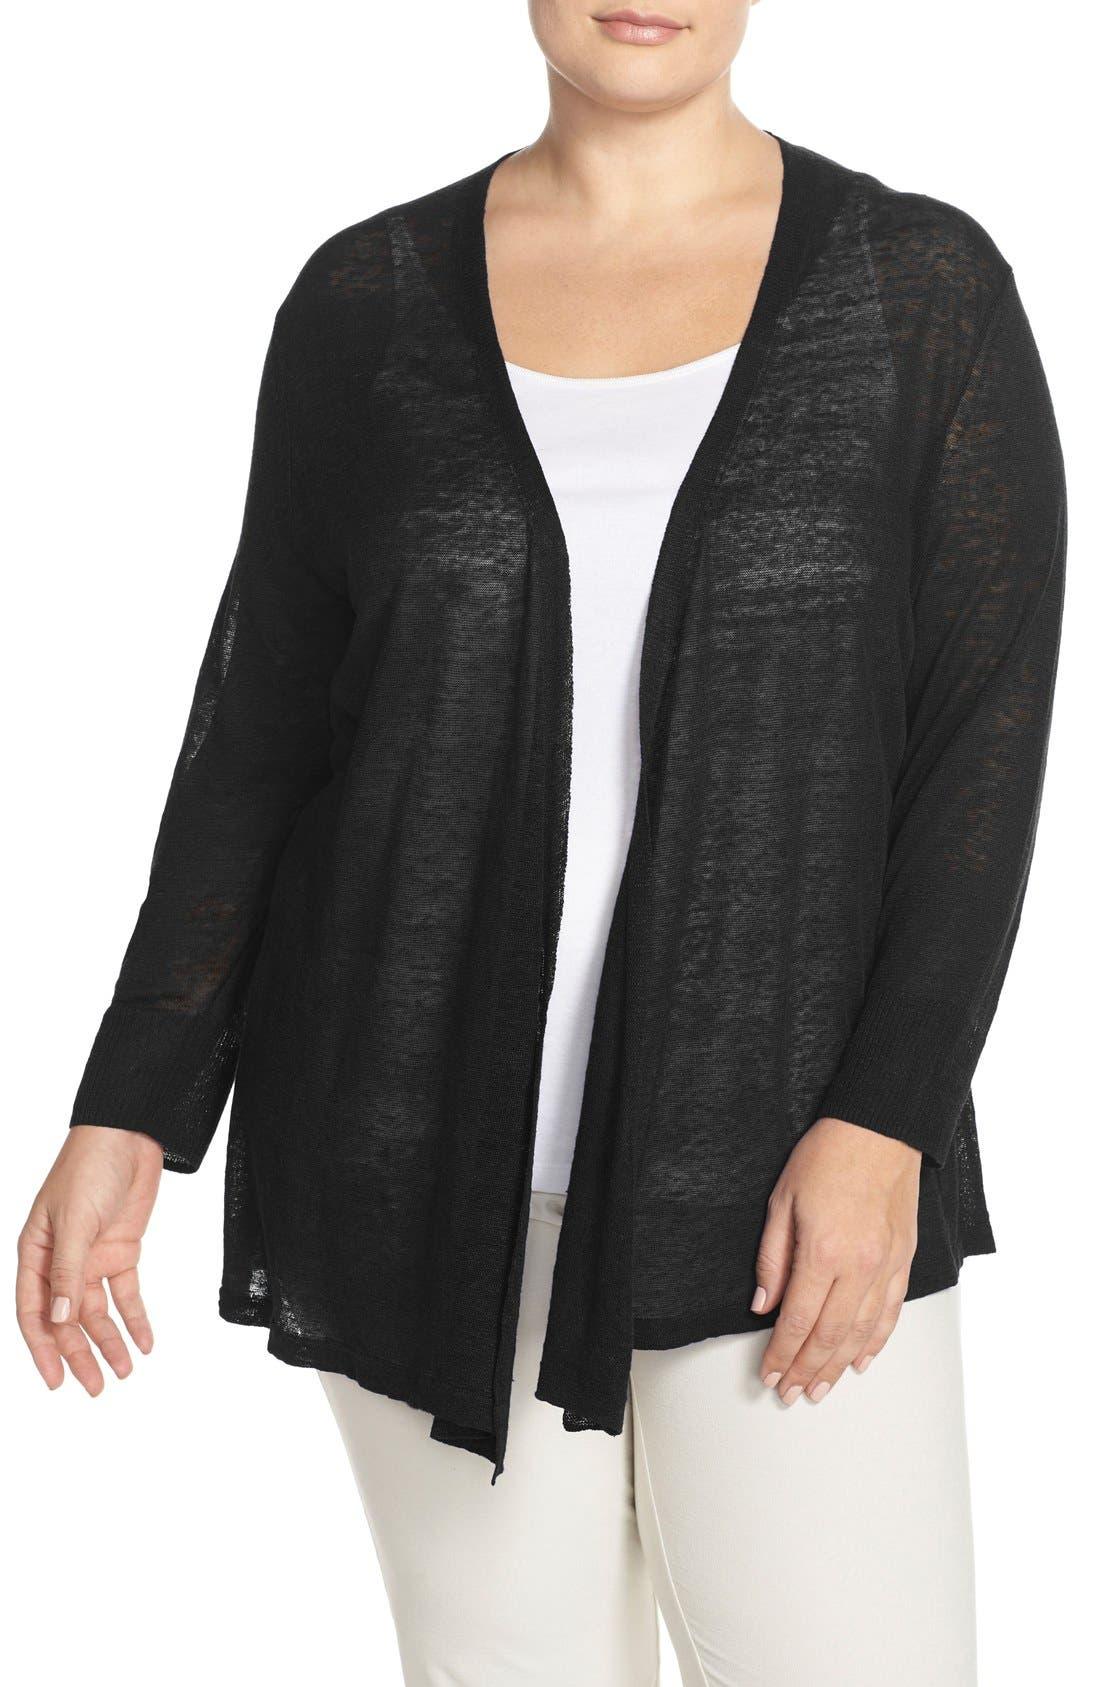 '4-Way' Three Quarter Sleeve Convertible Cardigan,                         Main,                         color, BLACK ONYX